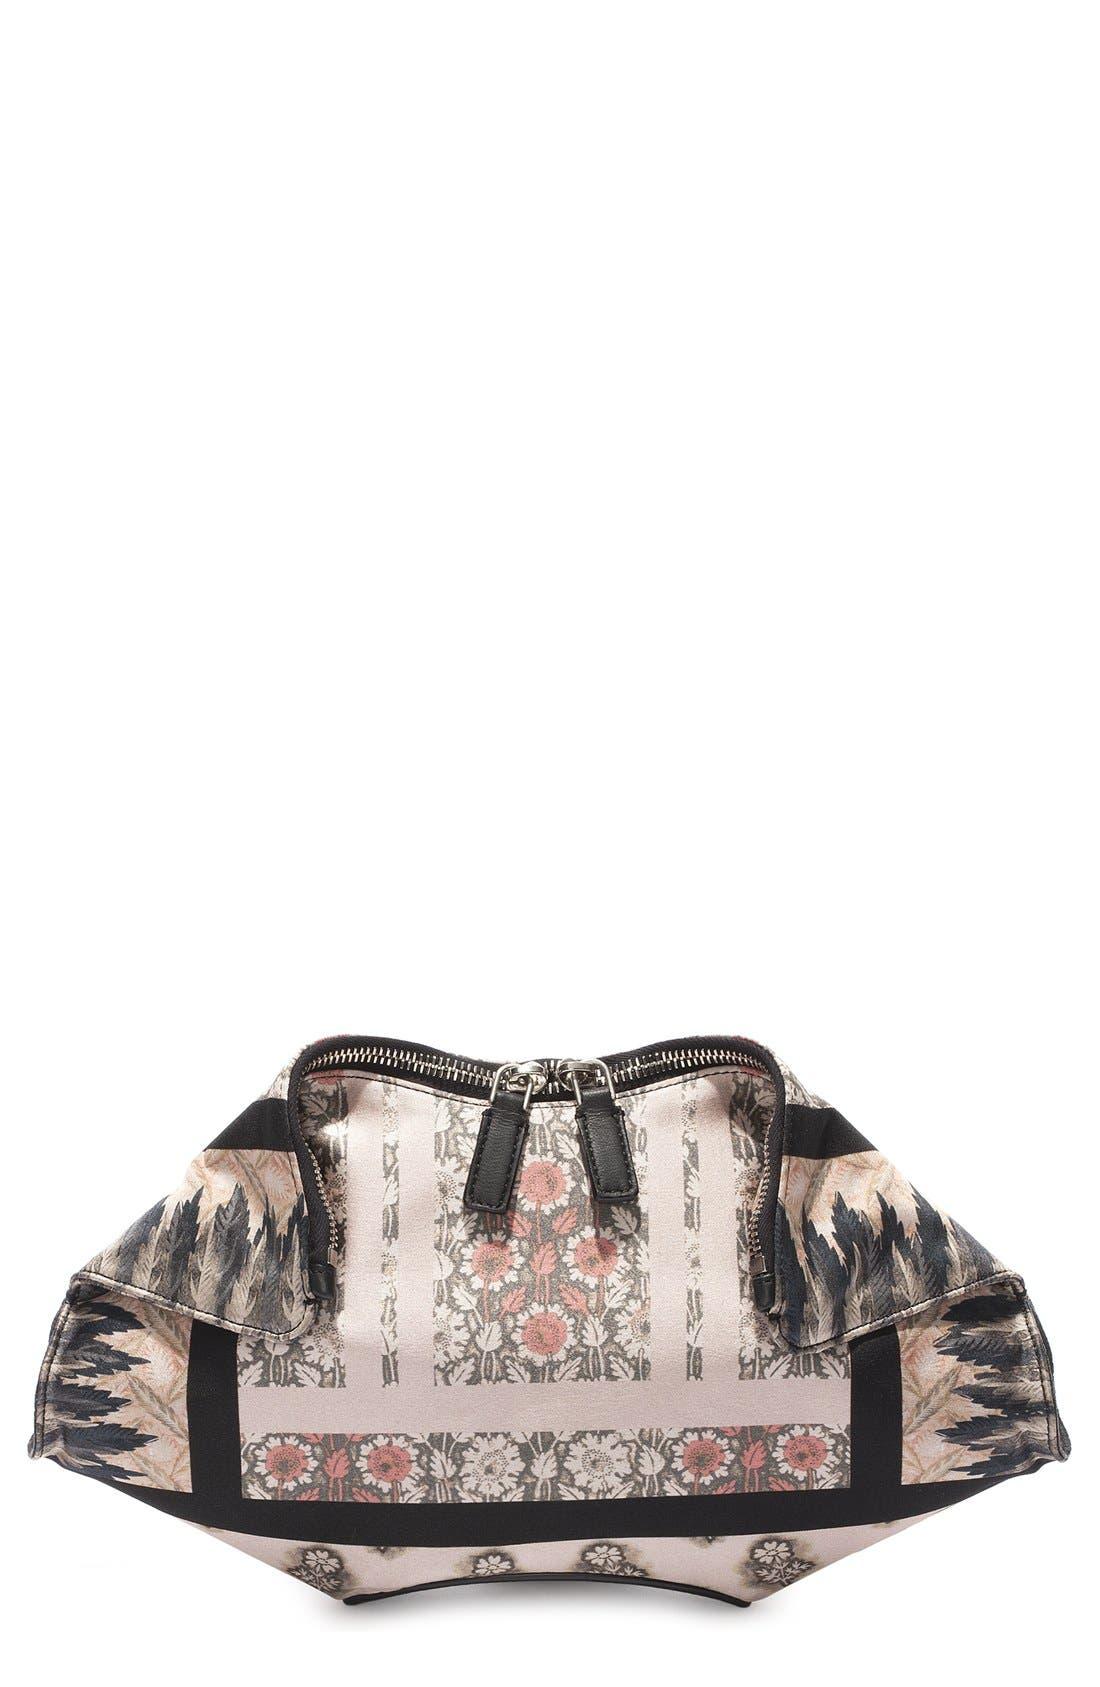 Alternate Image 1 Selected - Alexander McQueen 'Small De Manta' Floral Print Silk Clutch